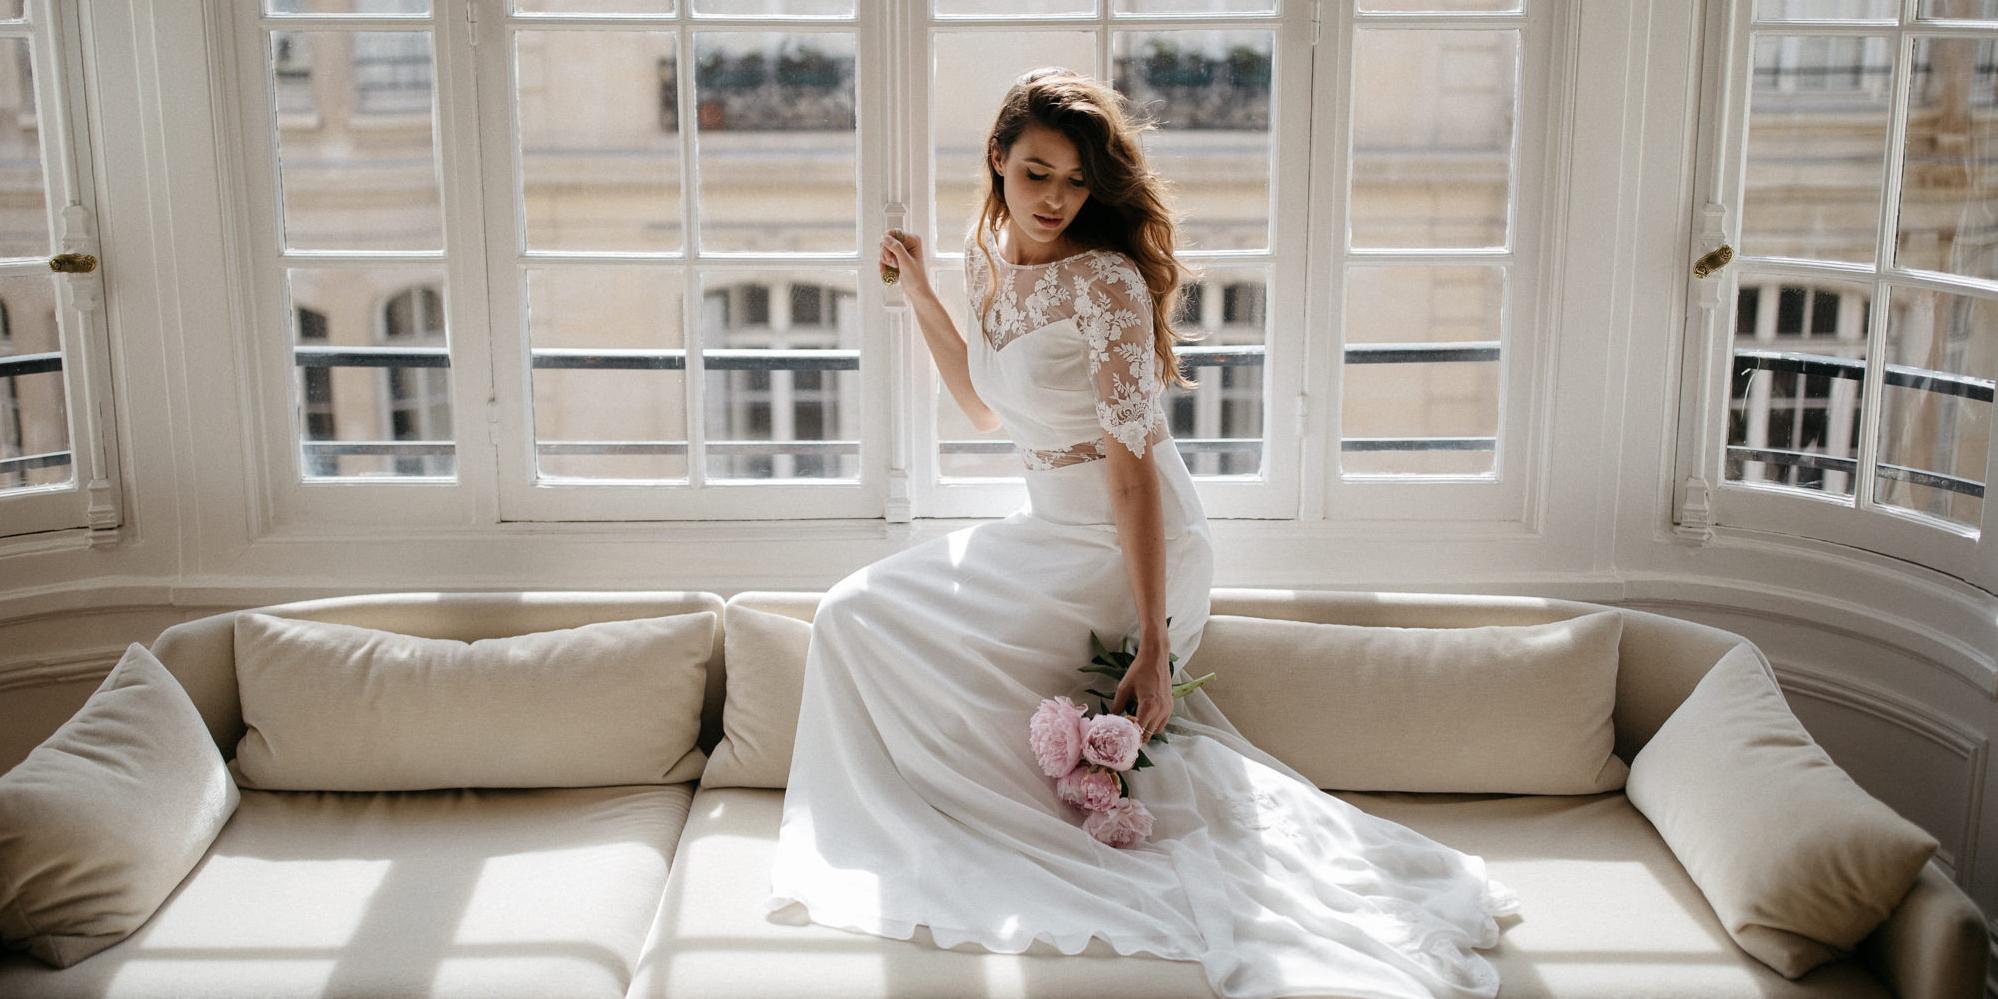 sophie sarfati sa collection de robes de mari e 2018 blog mariage mariage original pacs d co. Black Bedroom Furniture Sets. Home Design Ideas